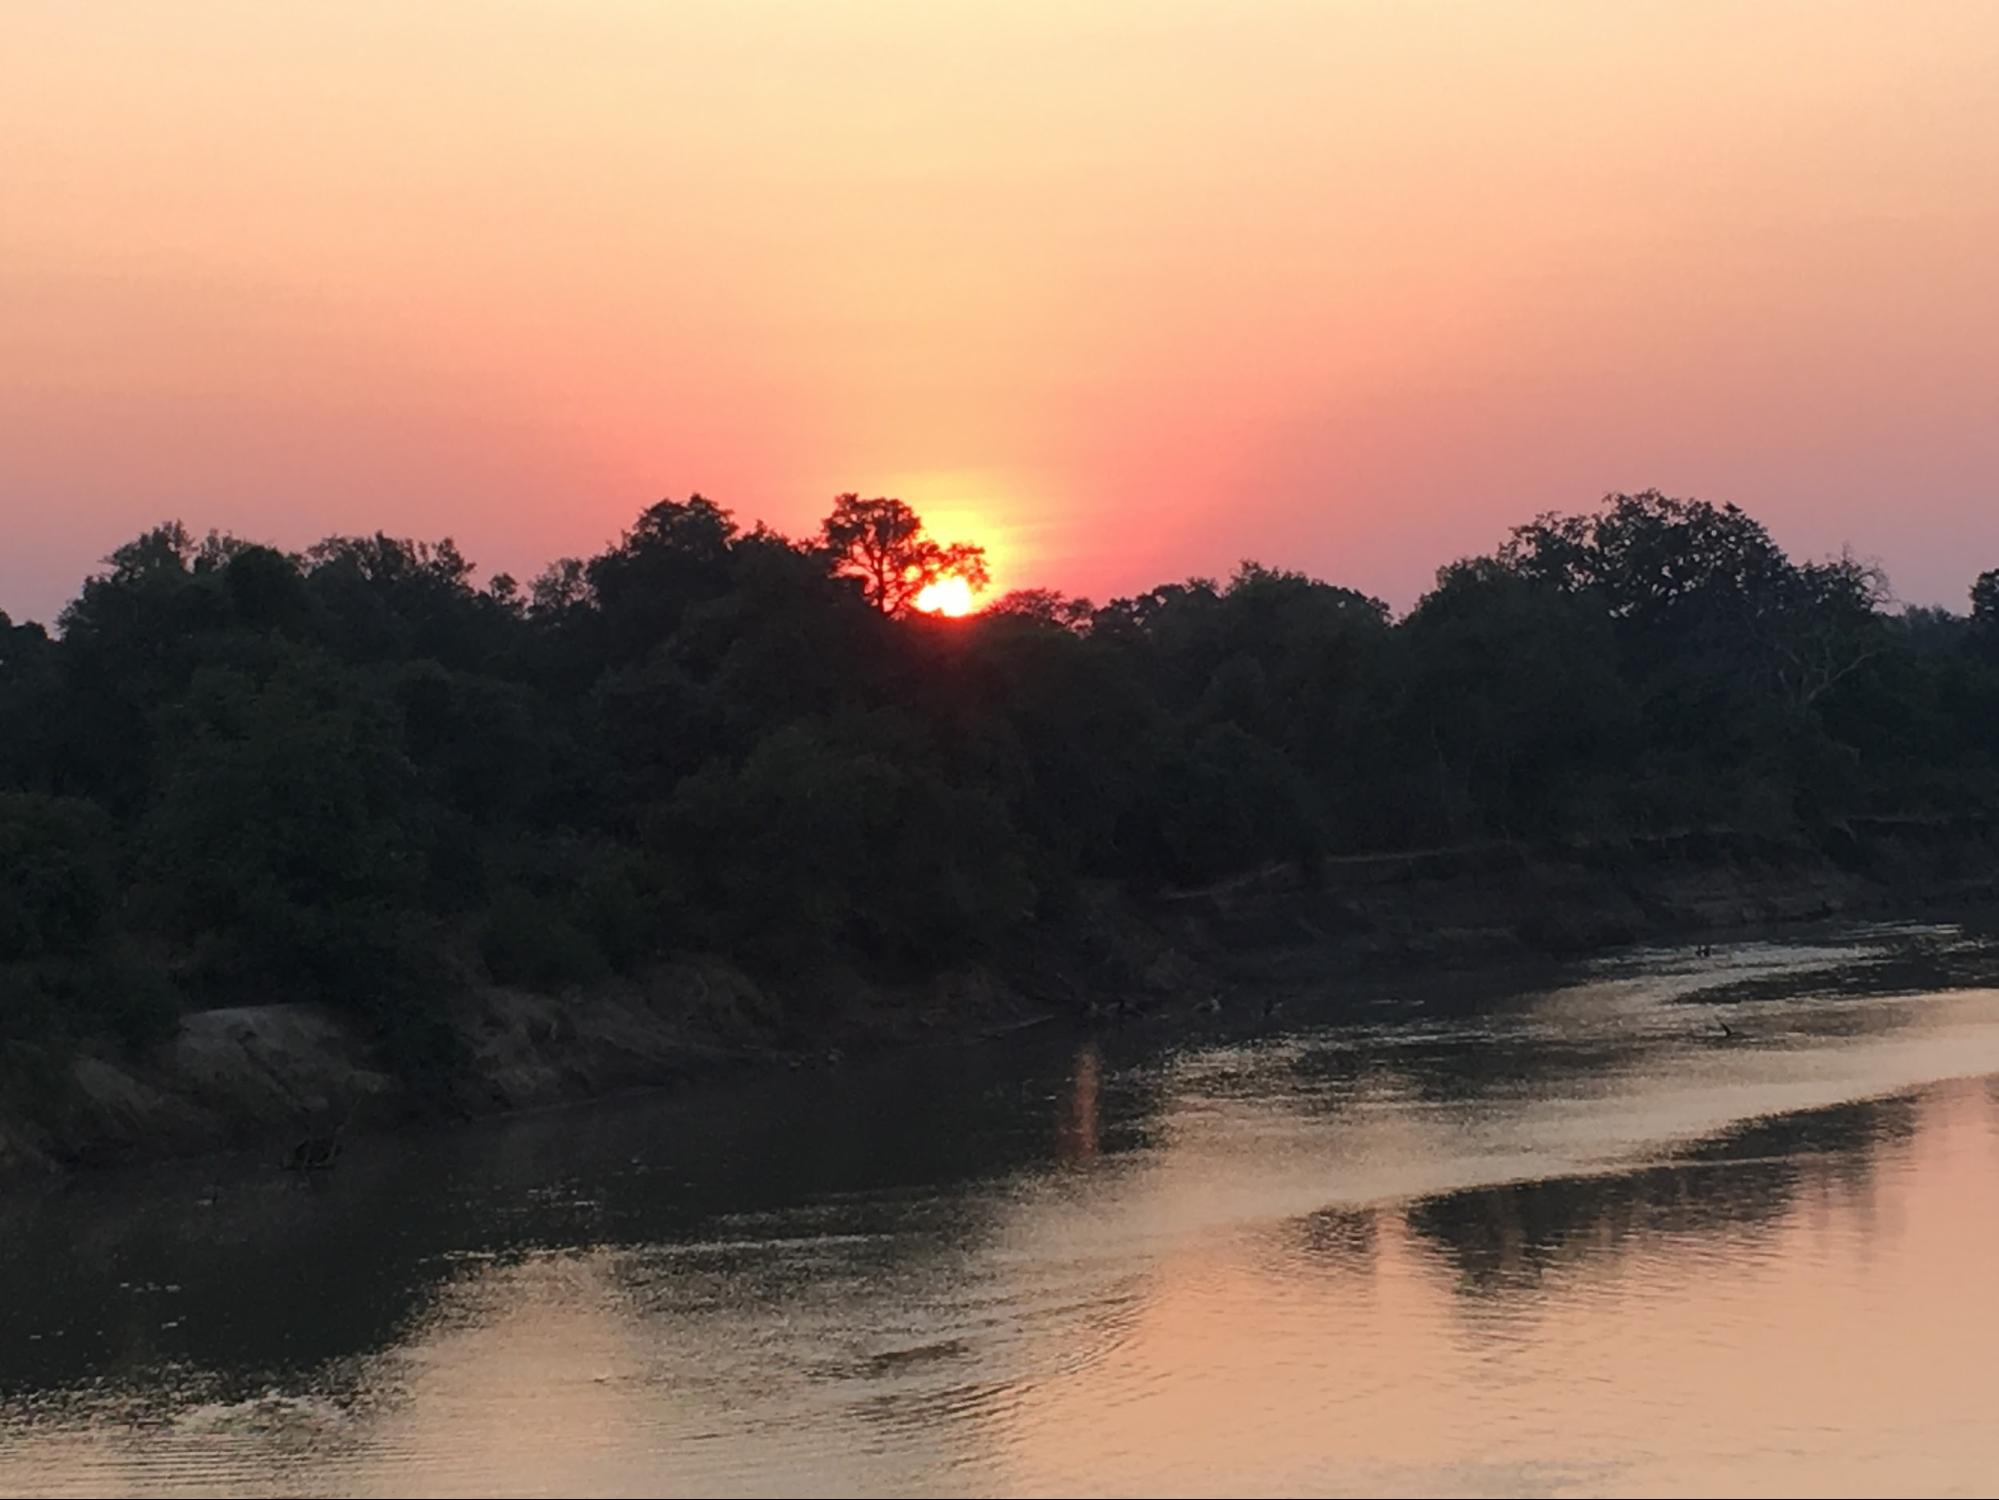 Malawi Scenery & Sunset